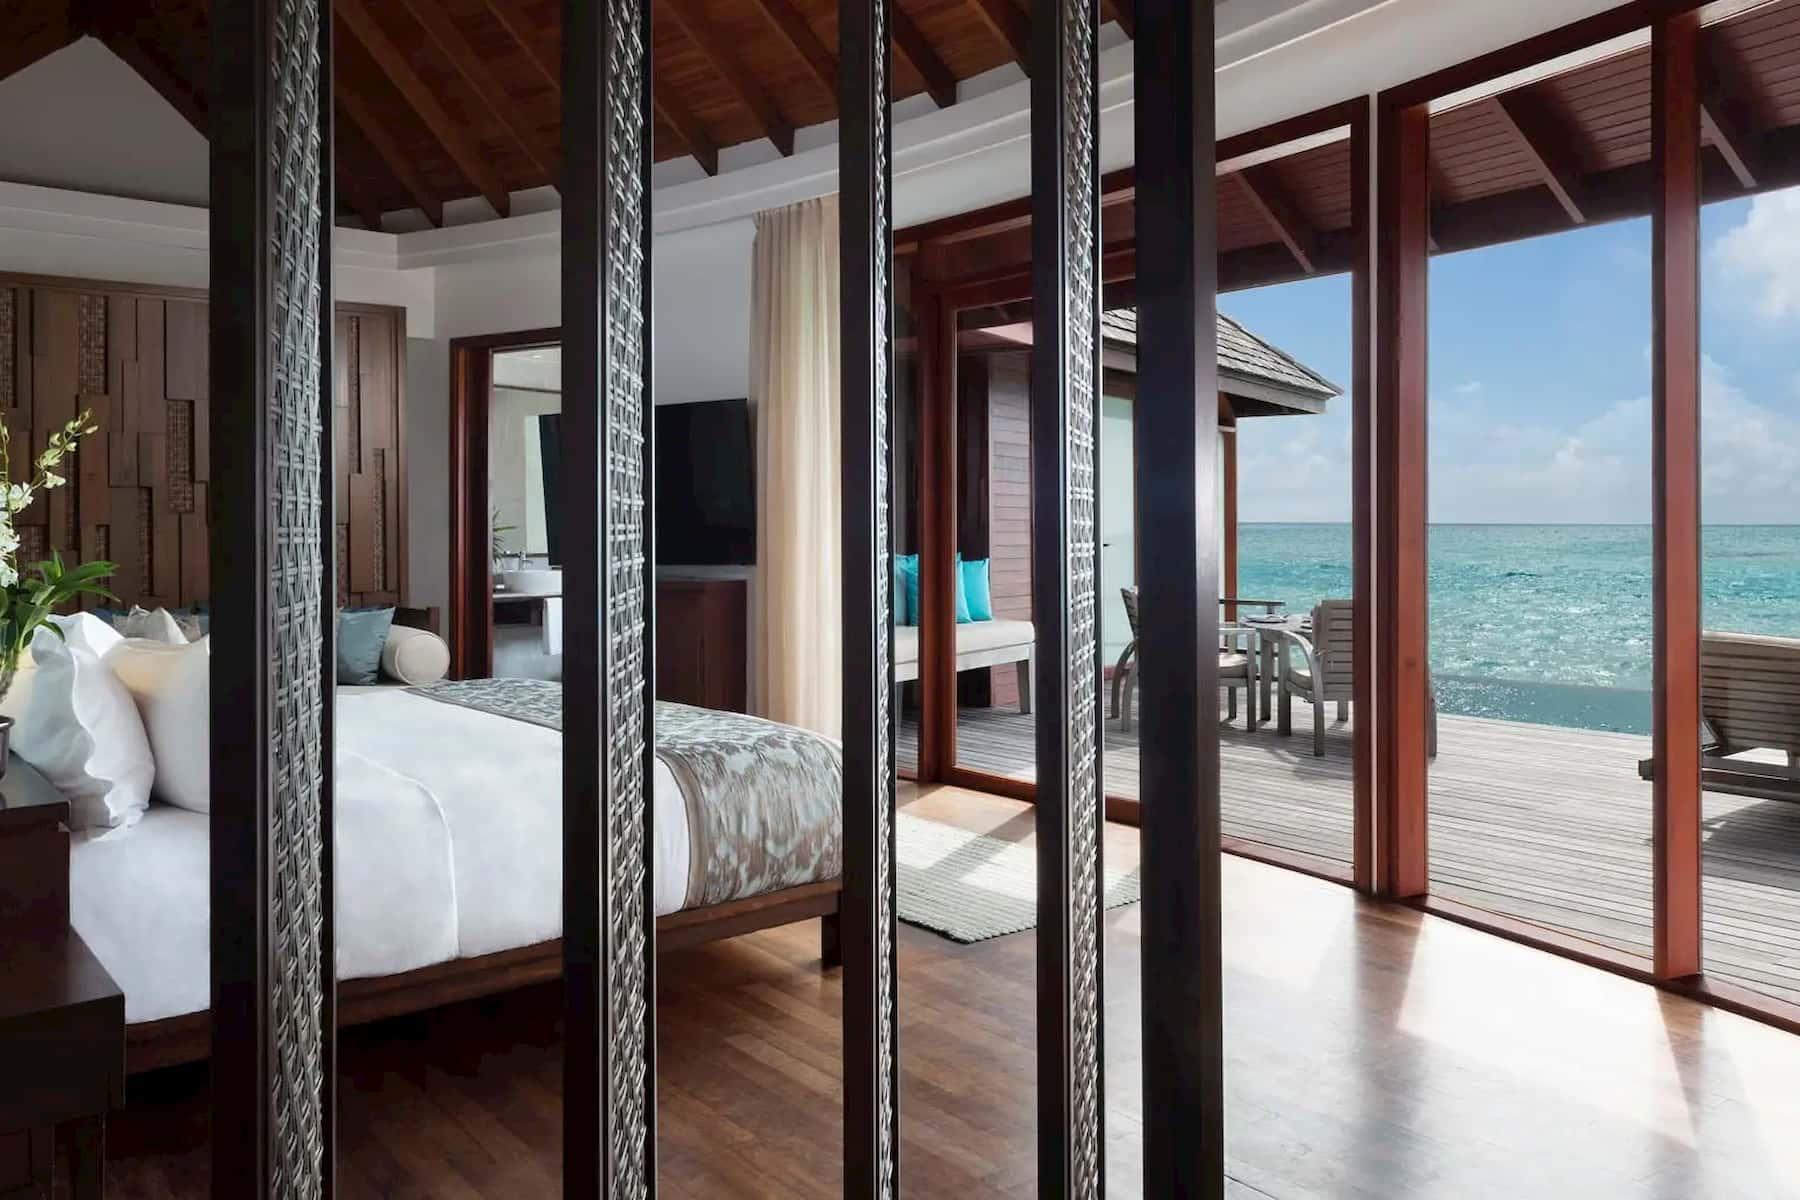 Anantara Dhigu resort Maldive overwater pool suite